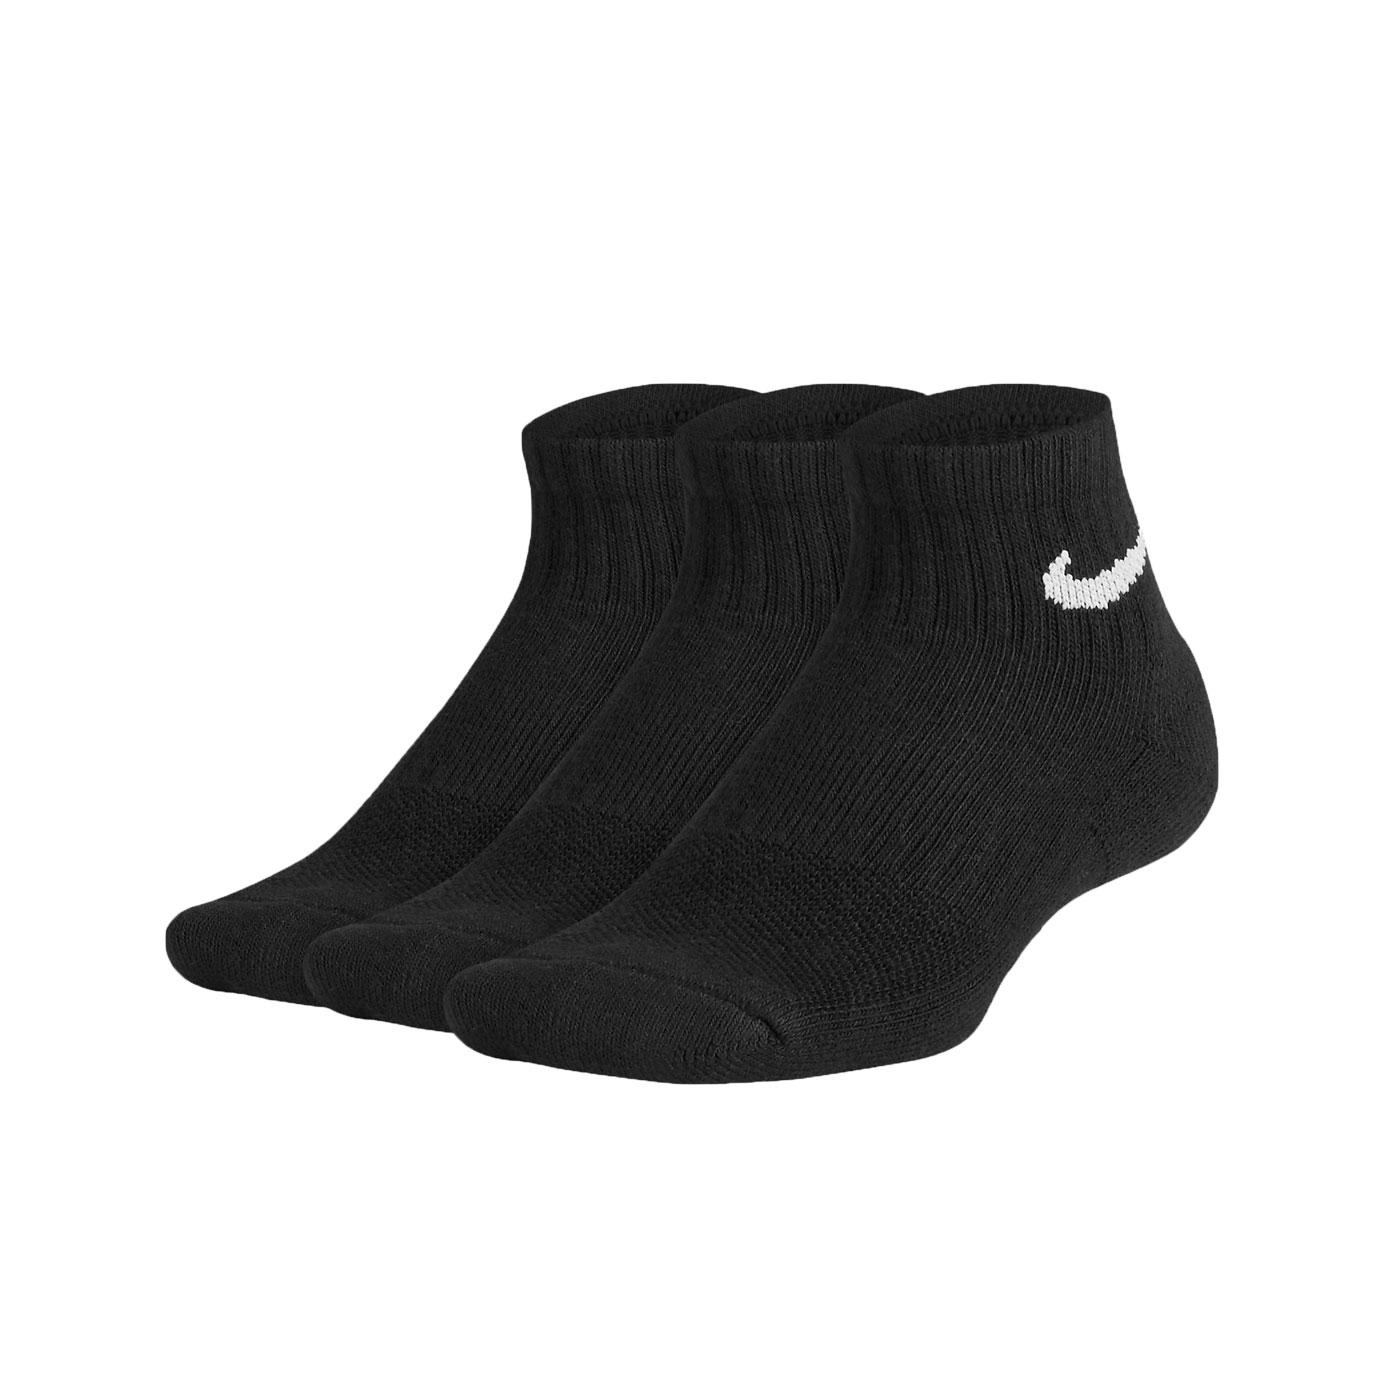 NIKE 運動短襪(三雙入) SX6844-010 - 黑白